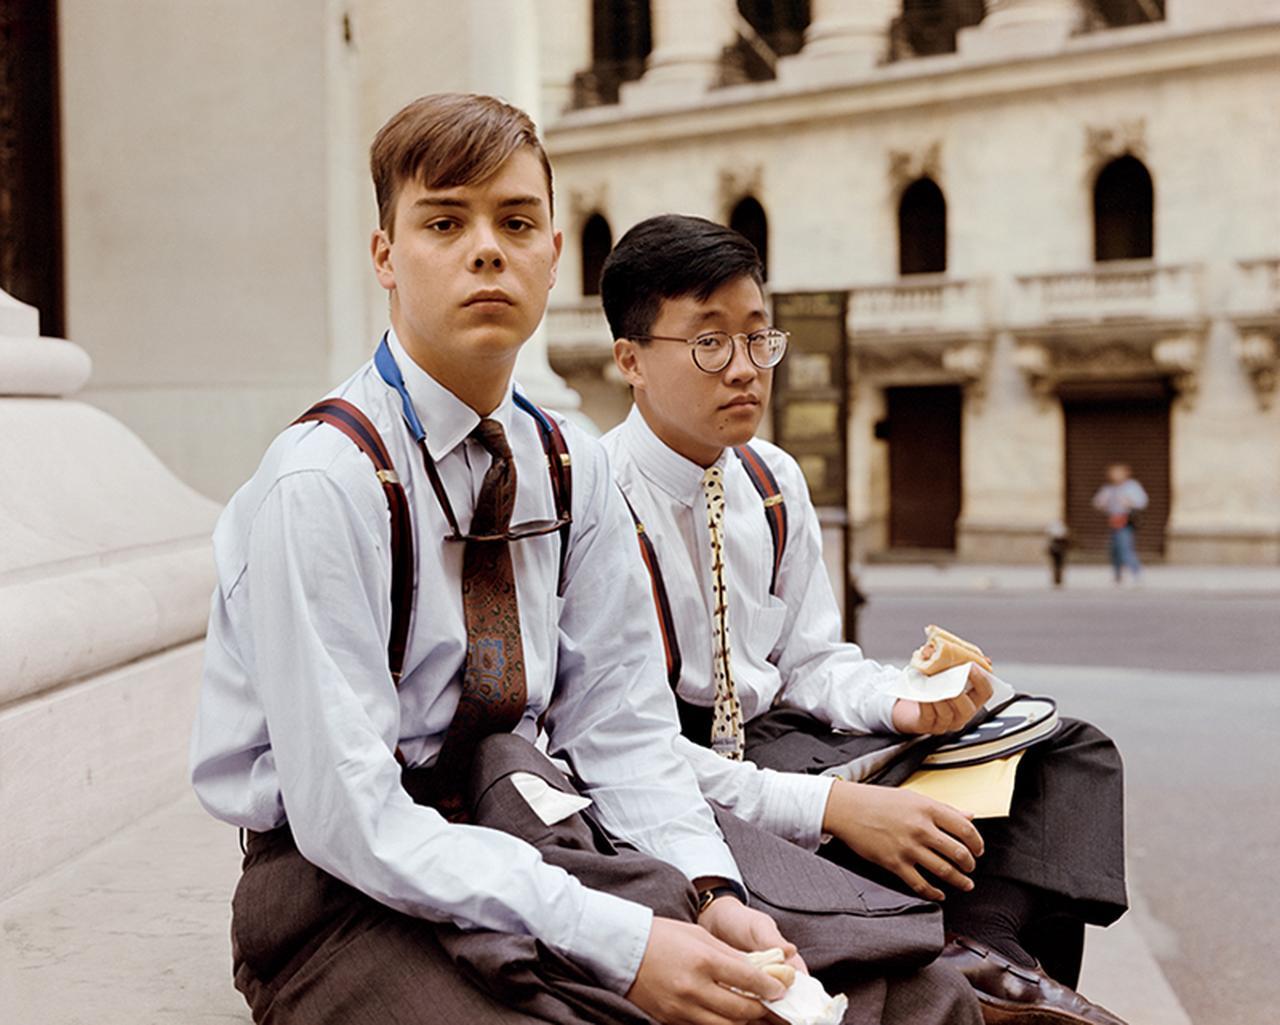 Images : 12番目の画像 - 「シルヴィア・フェンディ、 「私の愛する人たち、 人生を彩るものやこと」」のアルバム - T JAPAN:The New York Times Style Magazine 公式サイト